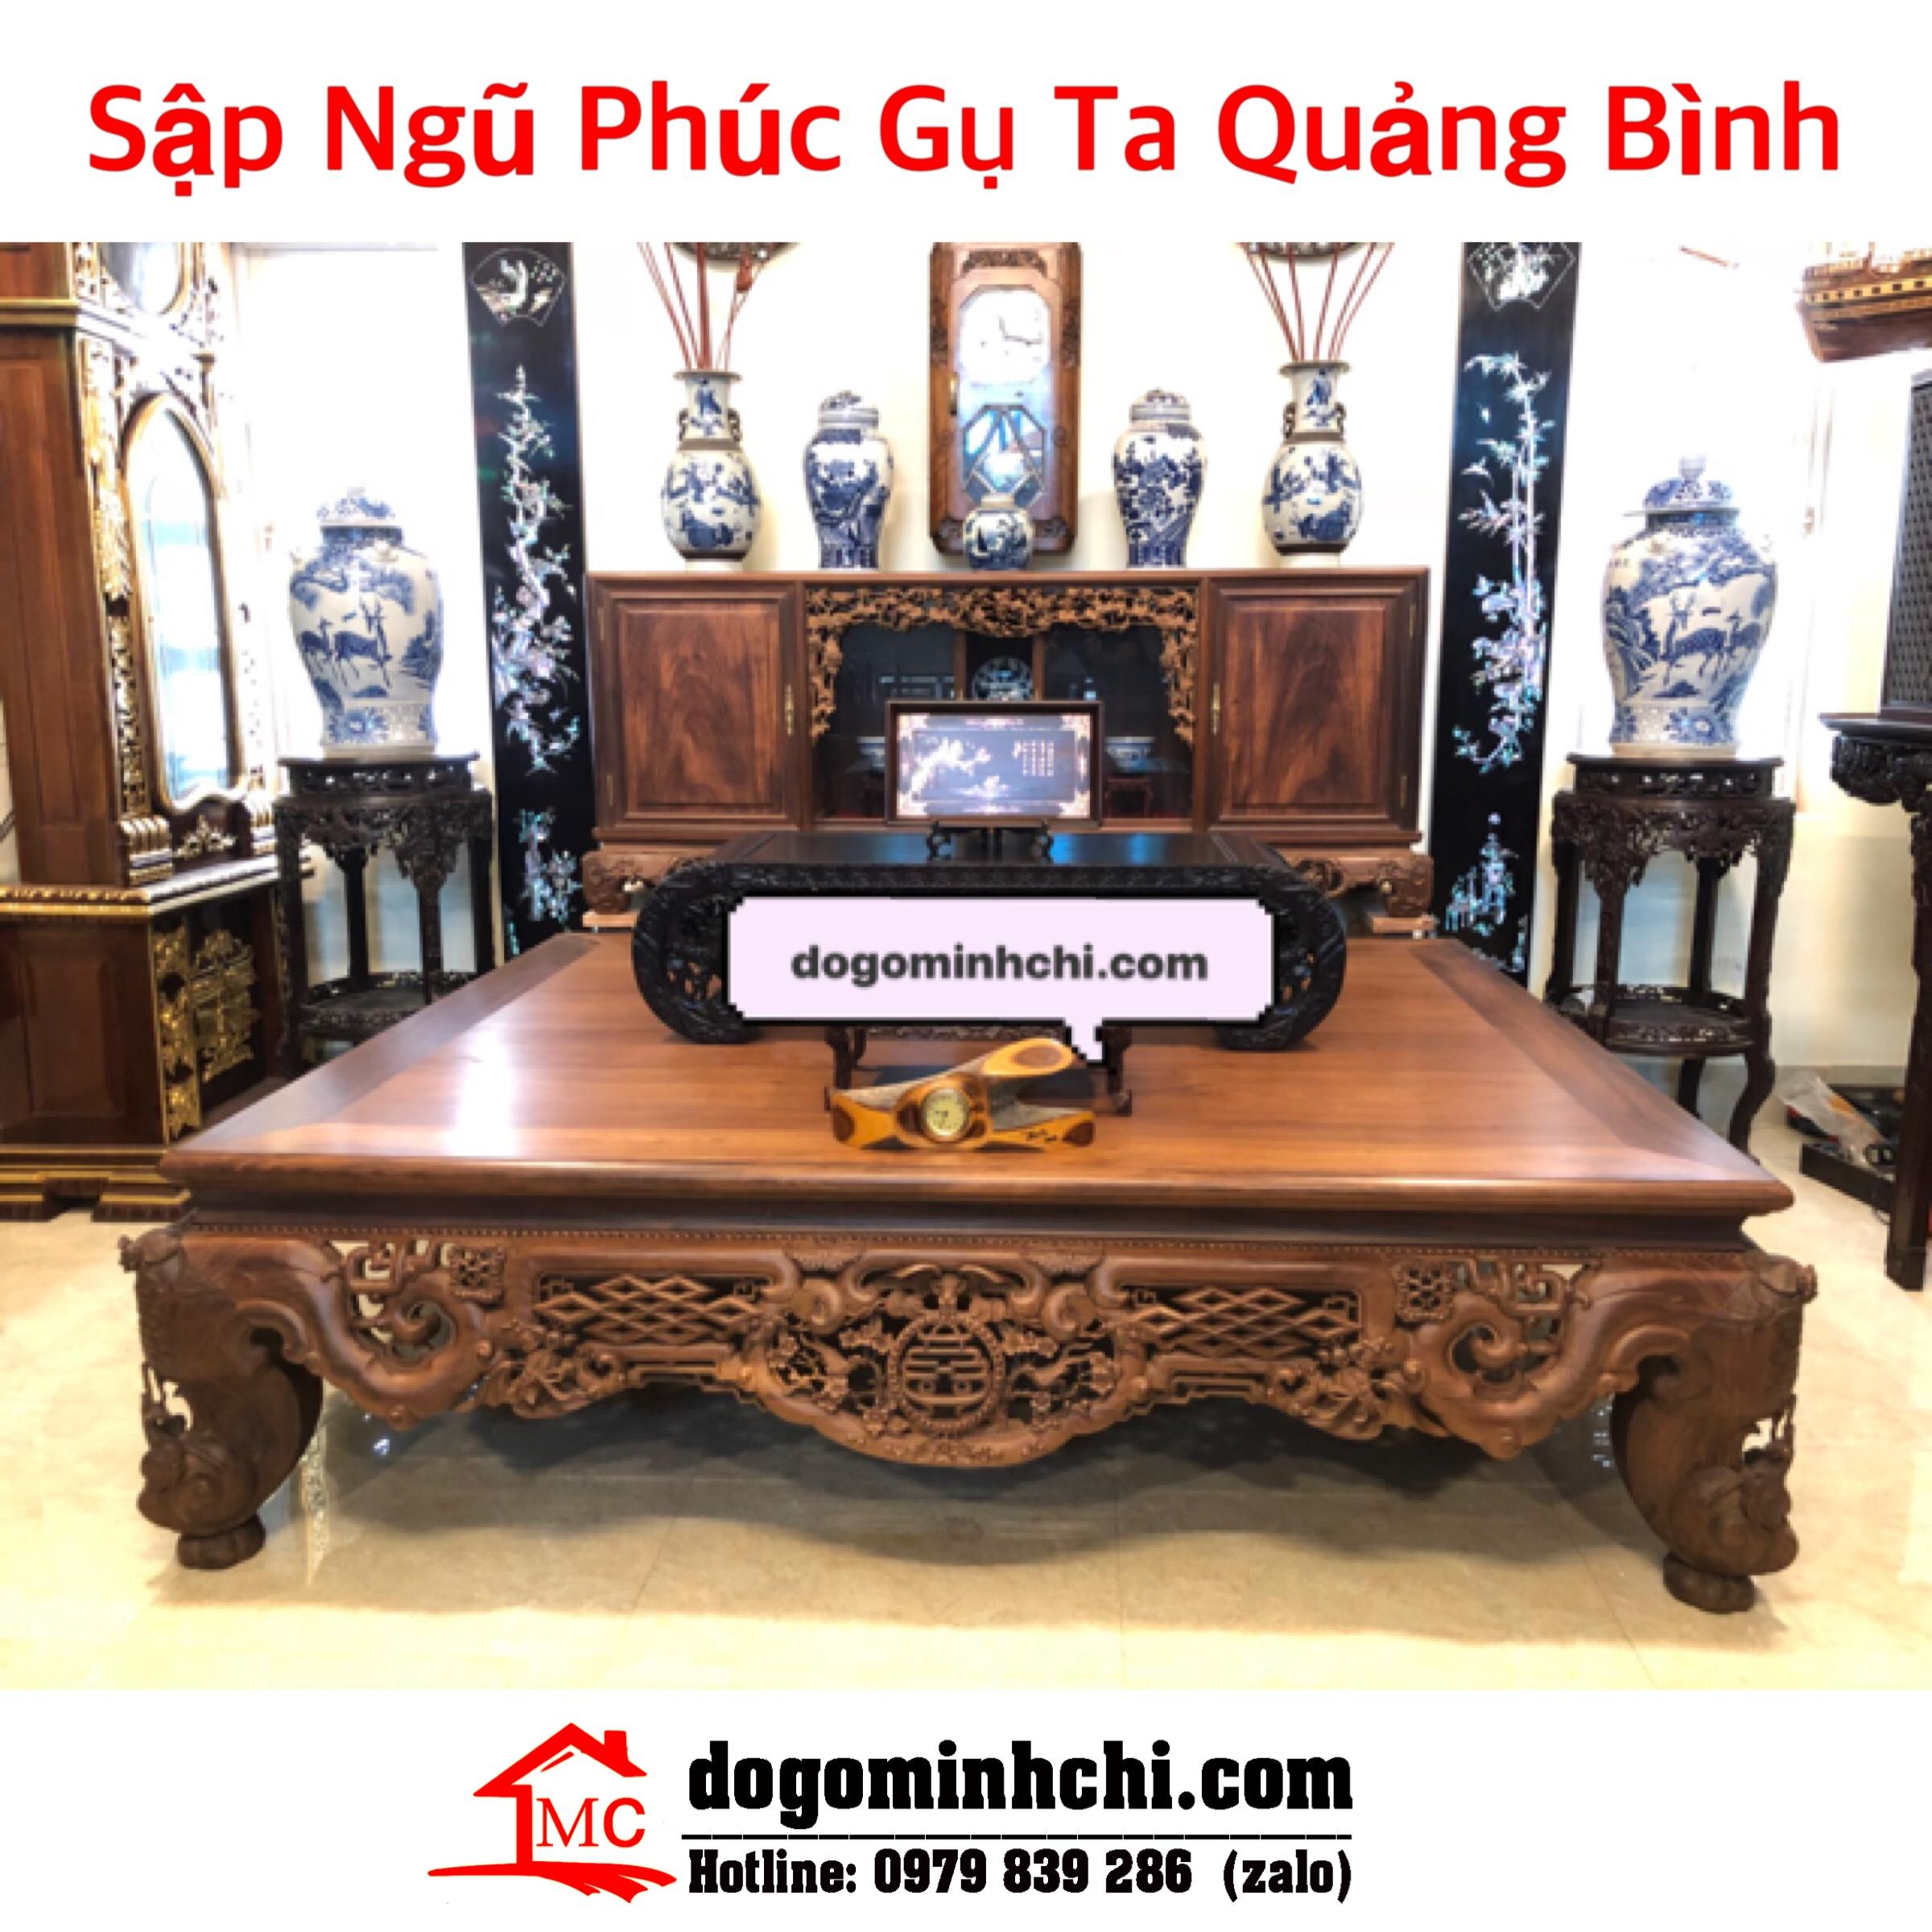 Bo-Sap-Ngu-Phuc-Go-Gu-Ta-Quang-Binh-9